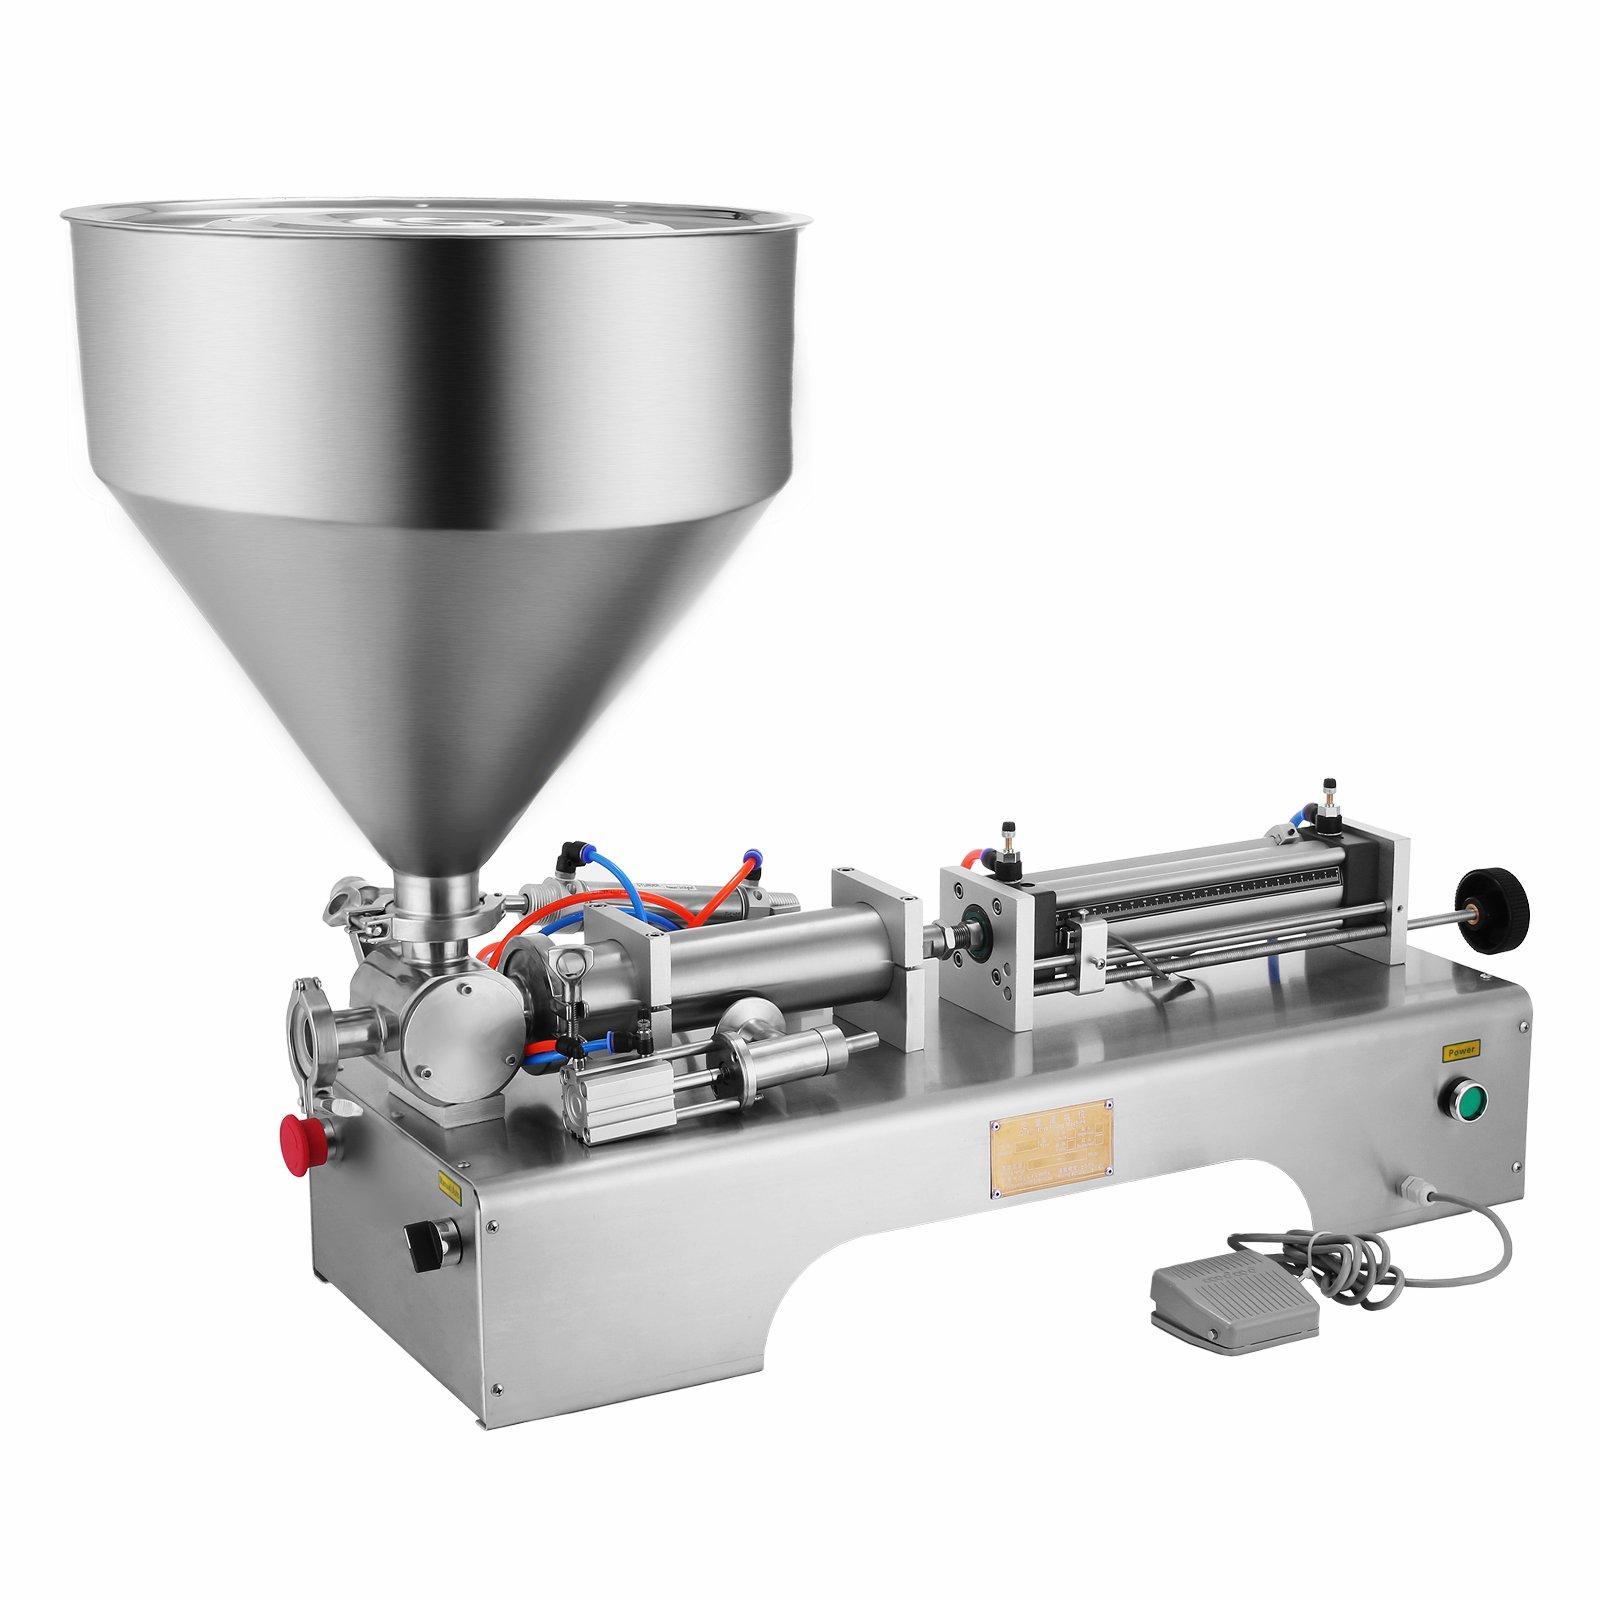 OrangeA Pneumatic Filling Machine 50-500ml Semi-auto Pneumatic Liquid Filling with 30L Hopper Liquid Filling Machine for Liquid and Paste Filling